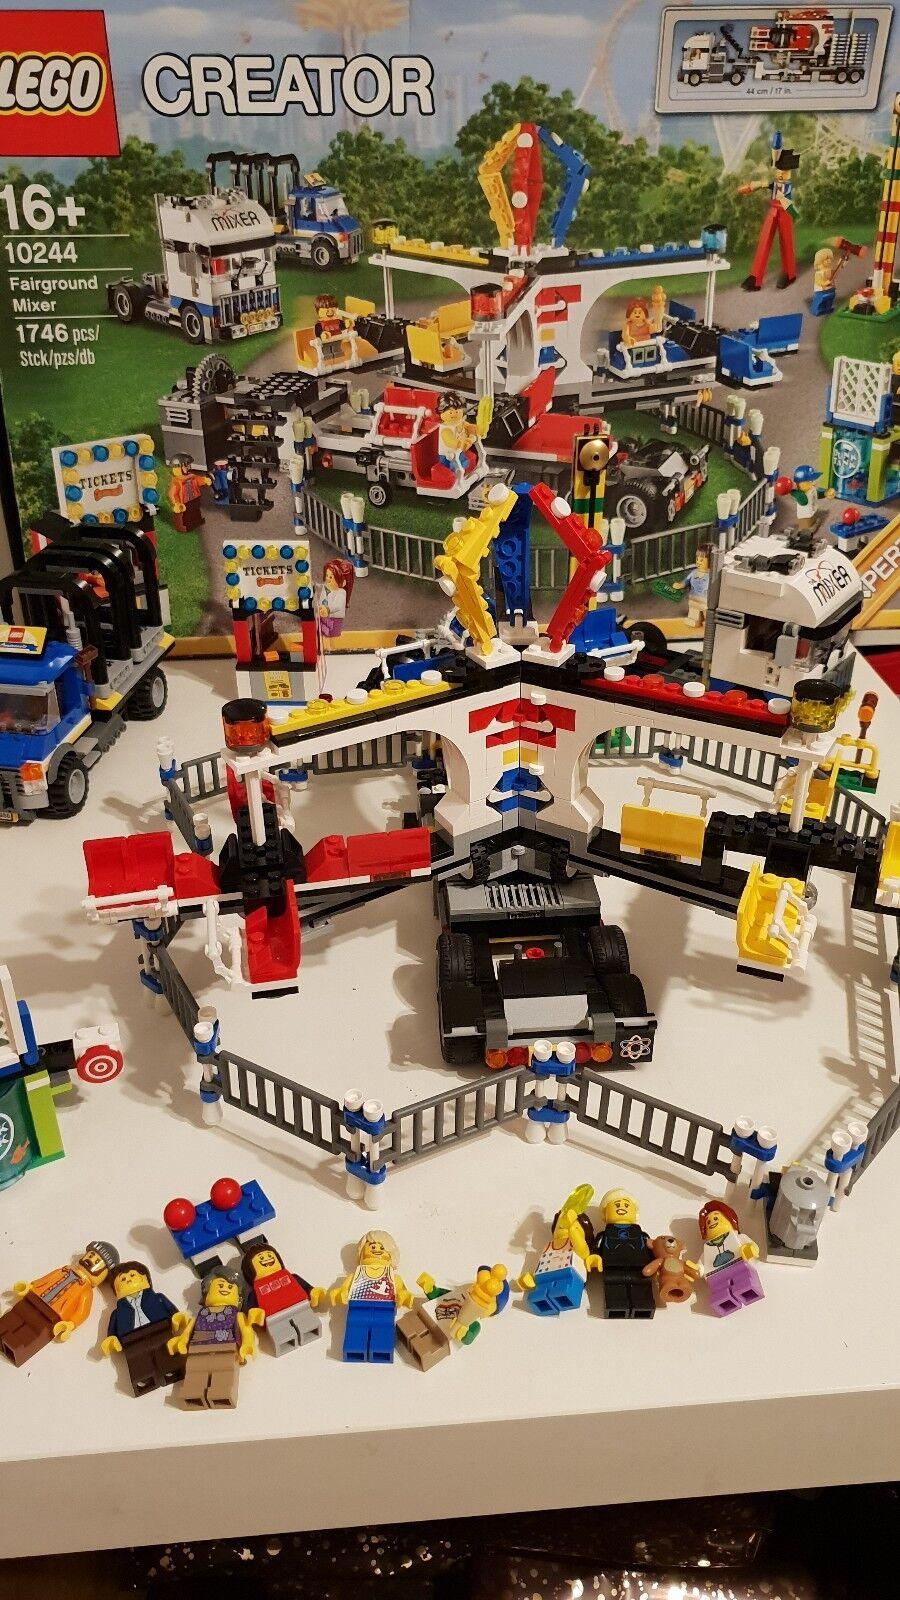 LEGO CREATOR GIOSTRE MIXER 10244 L